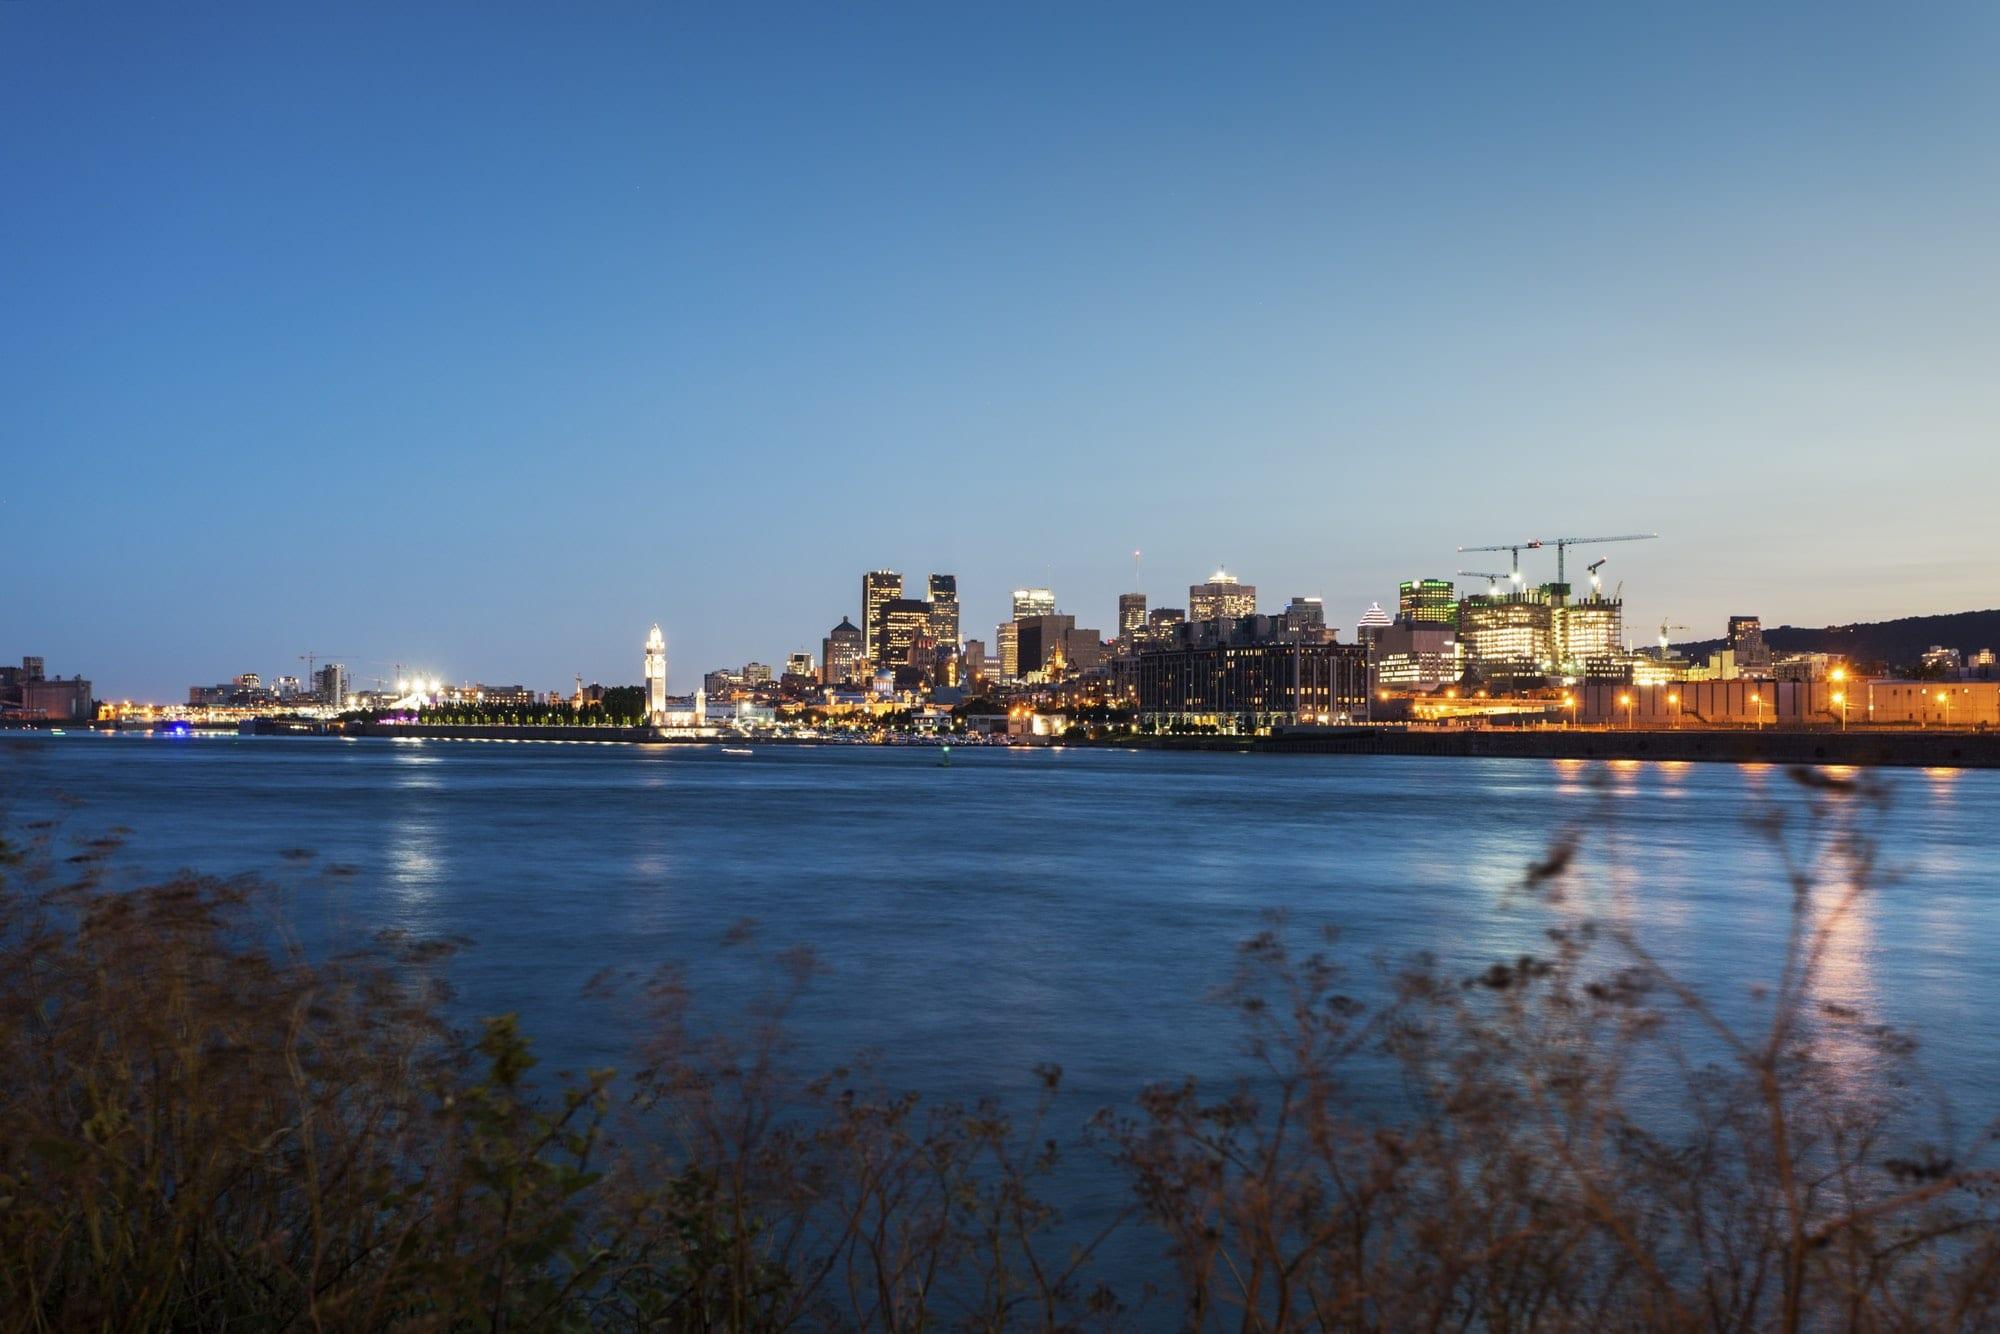 Panorama of Montreal at night